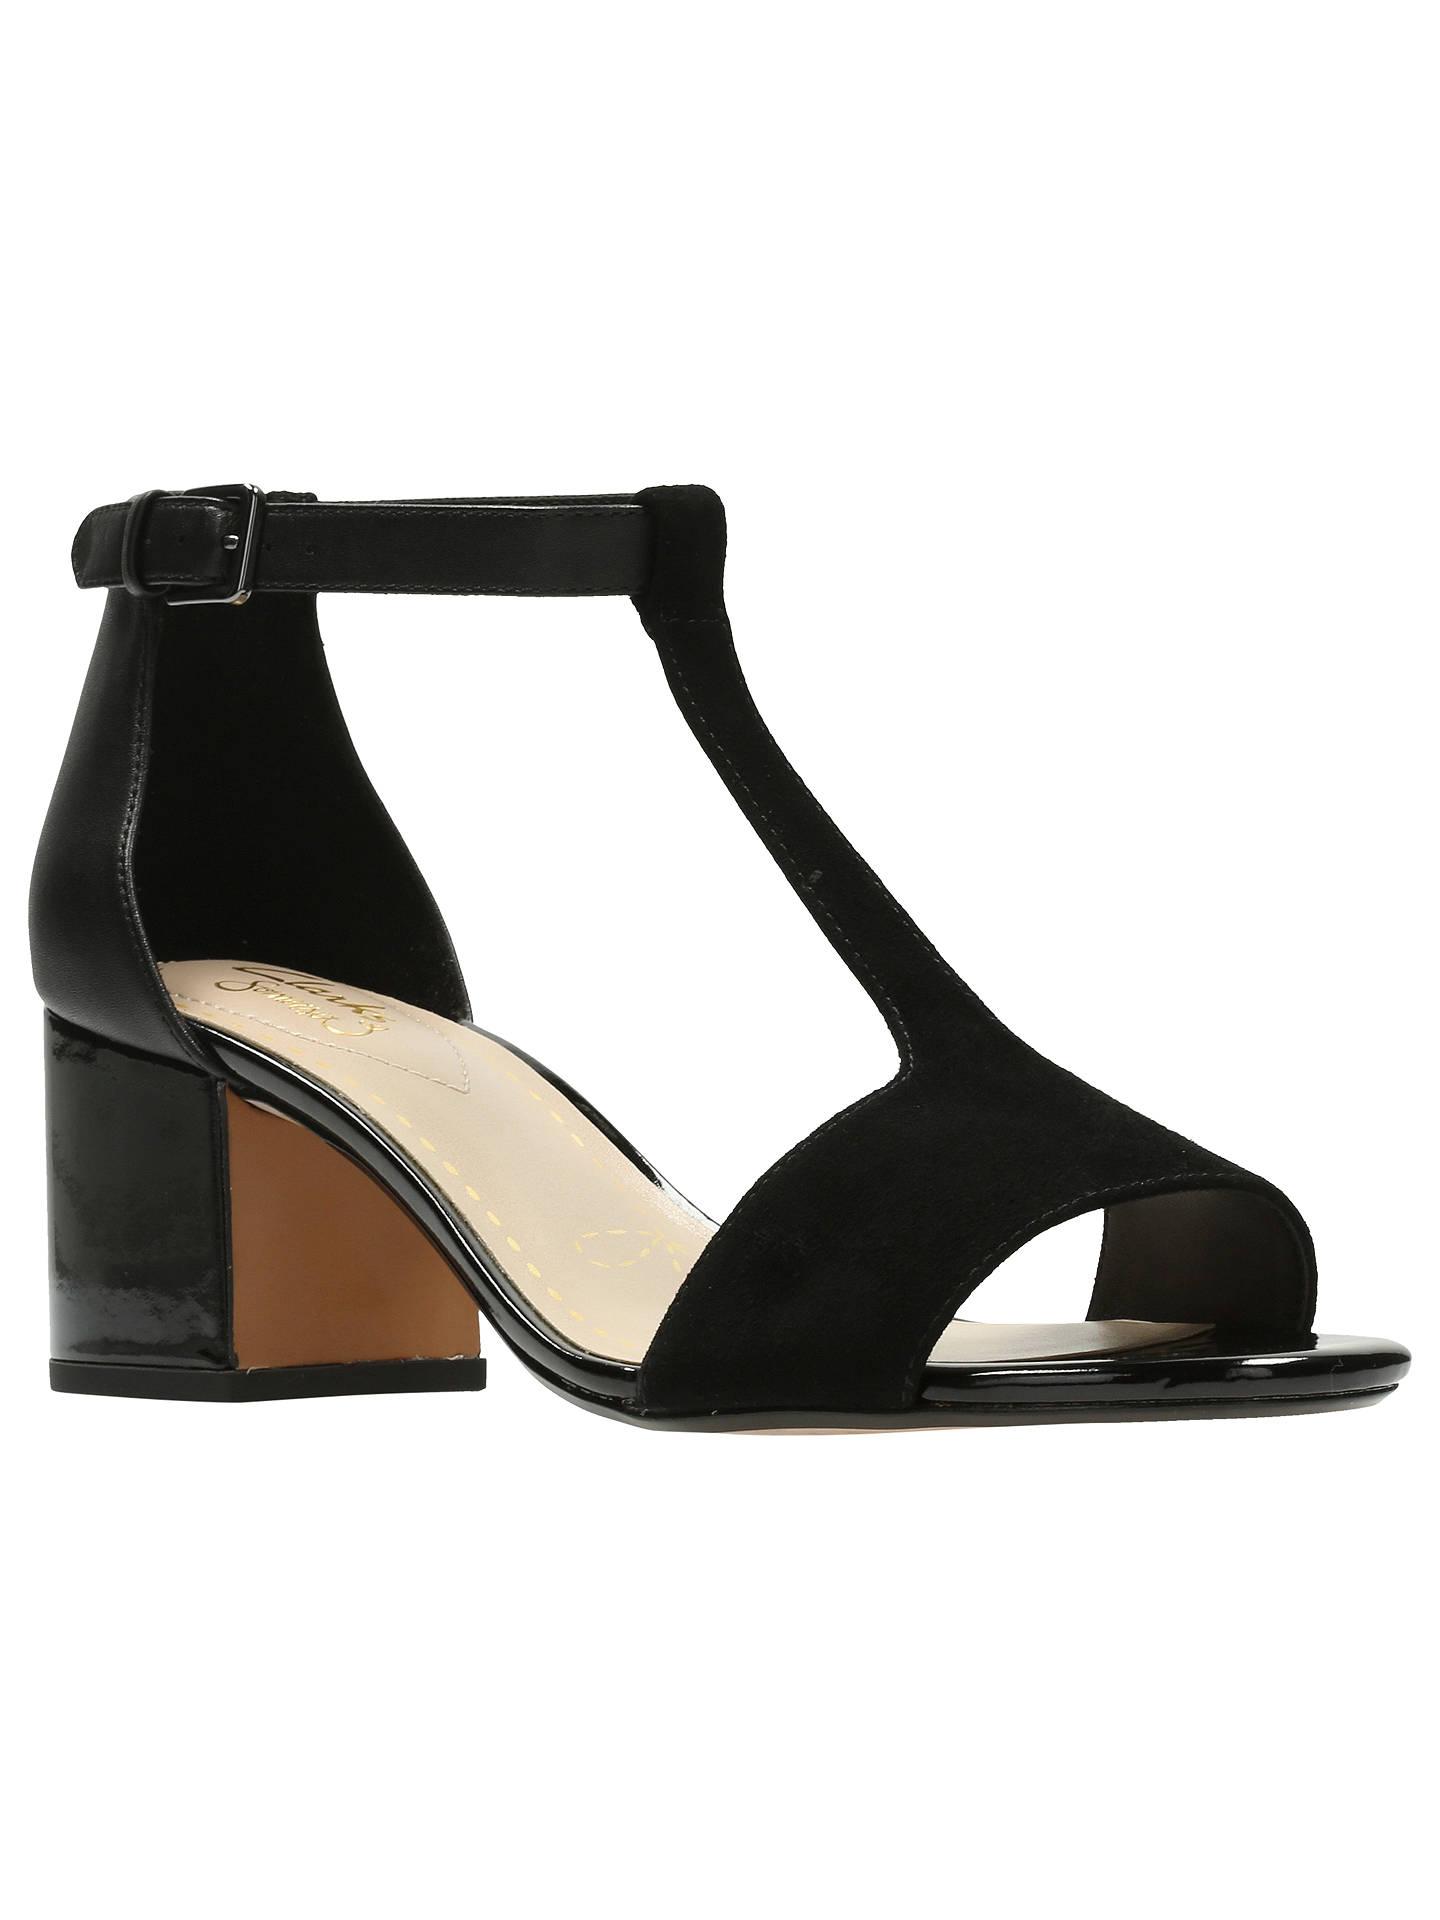 c636e6834f9 Buy Clarks Barley Belle T-Bar Sandals